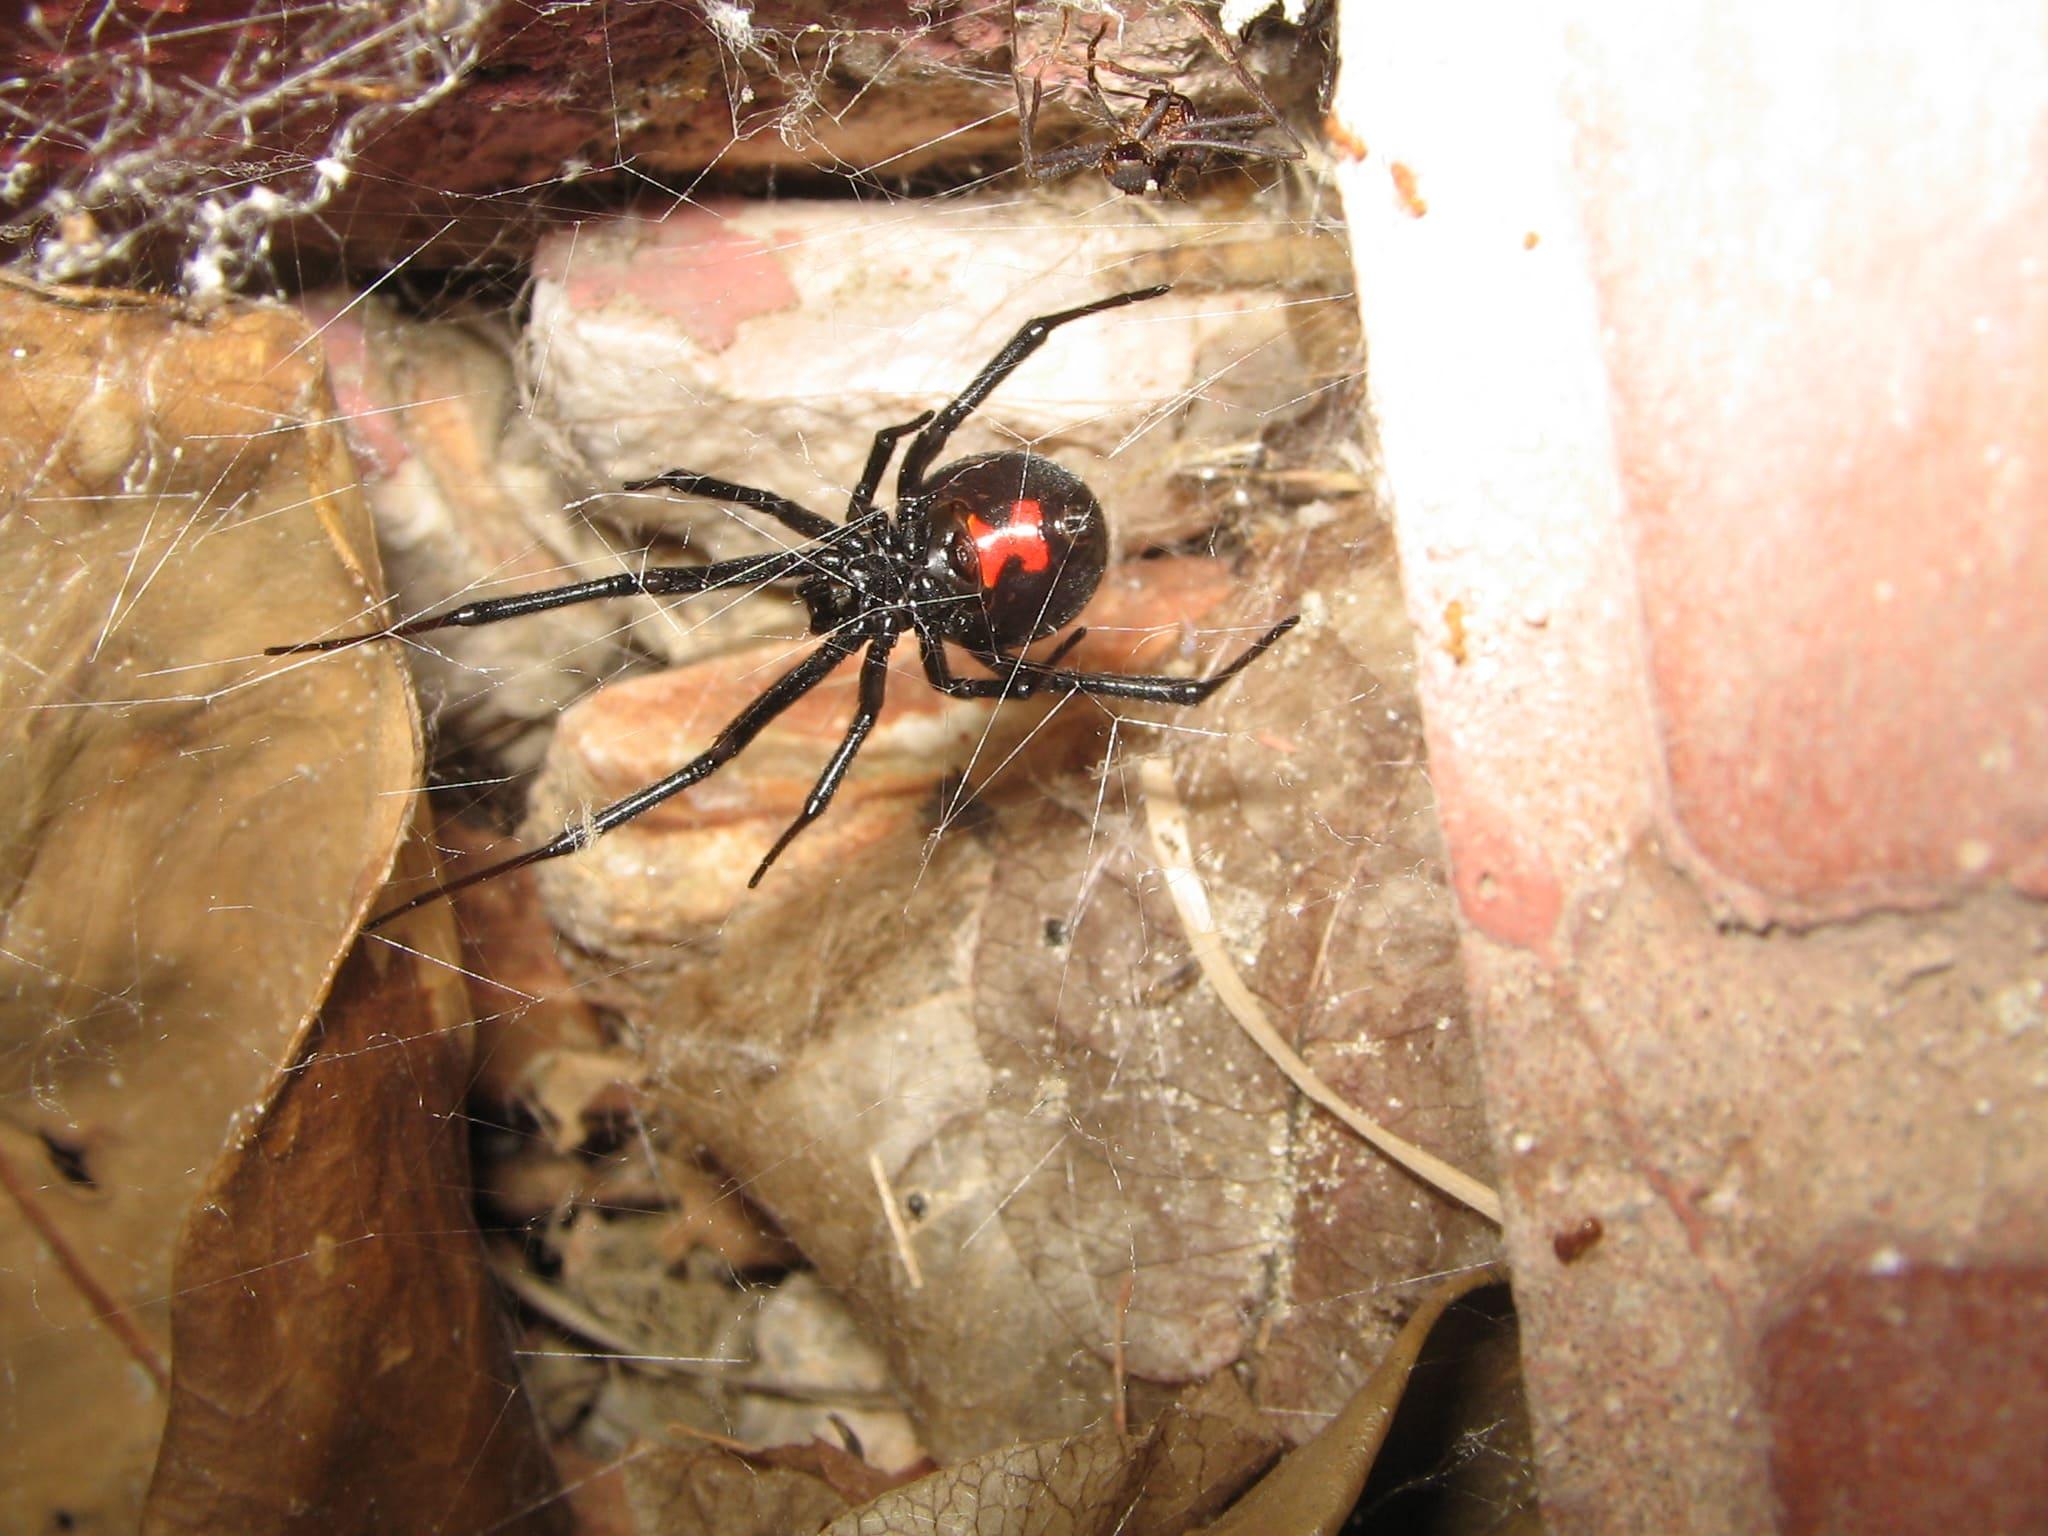 Araña Viuda Negra en su tela de araña - Wiki Animales